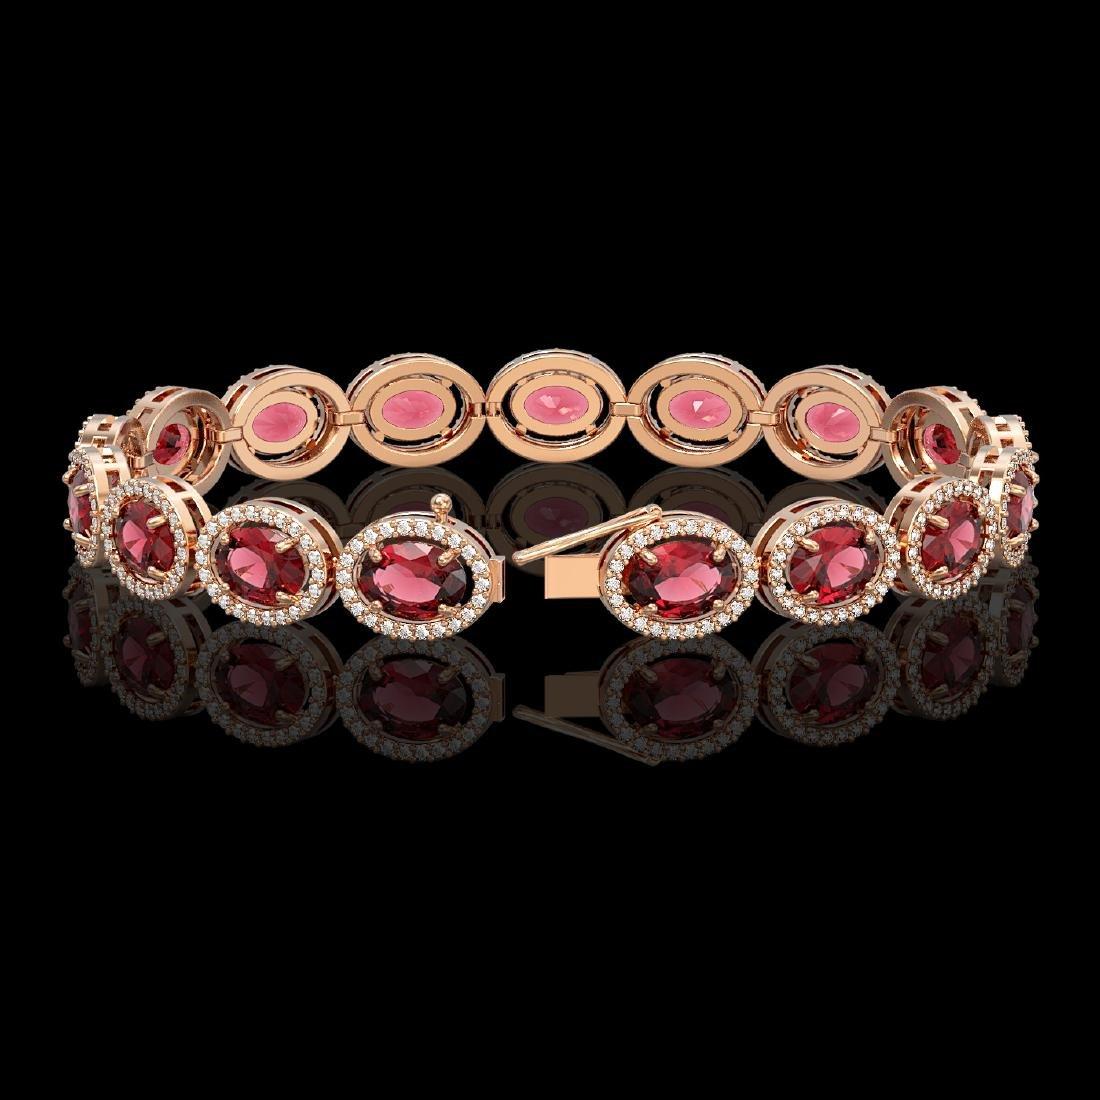 21.71 CTW Tourmaline & Diamond Halo Bracelet 10K Rose - 2